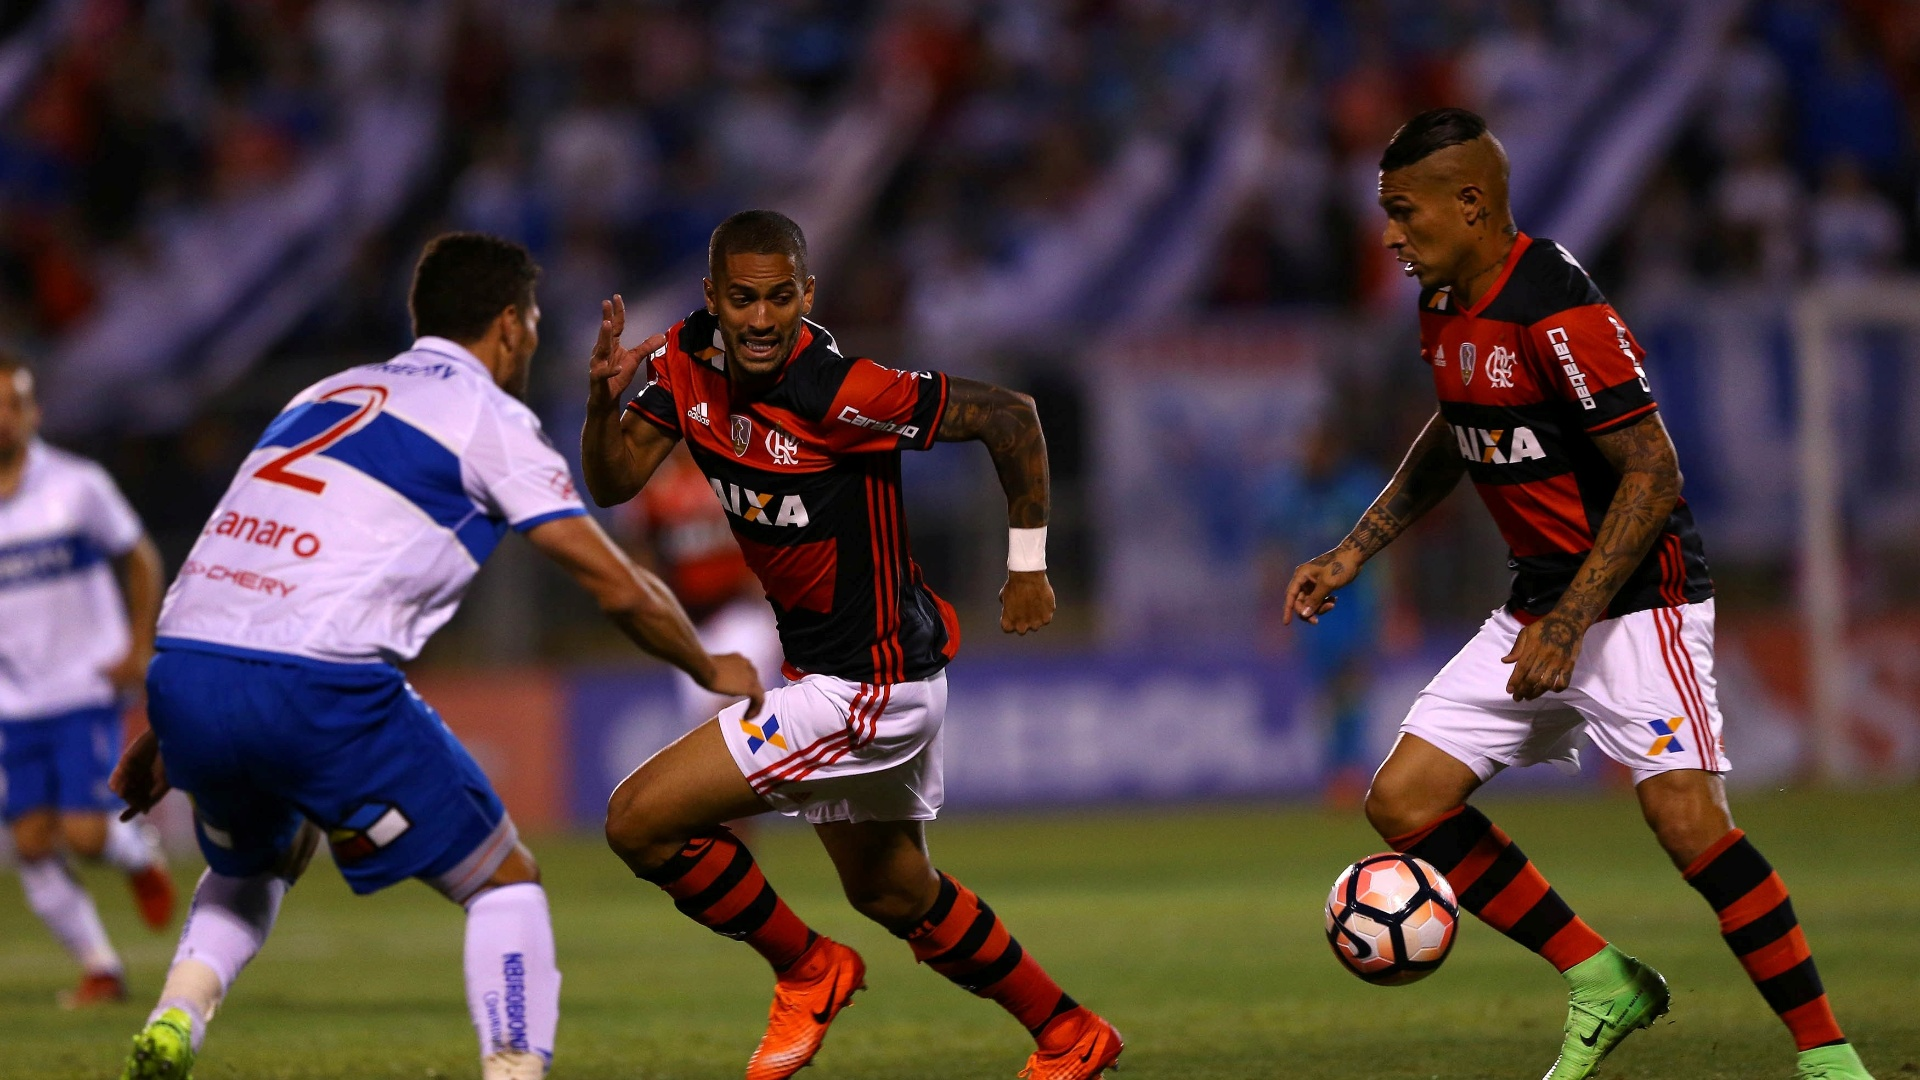 Rômulo observa Guerrero conduzindo a bola no duelo Unievrsidad Católica x Flamengo